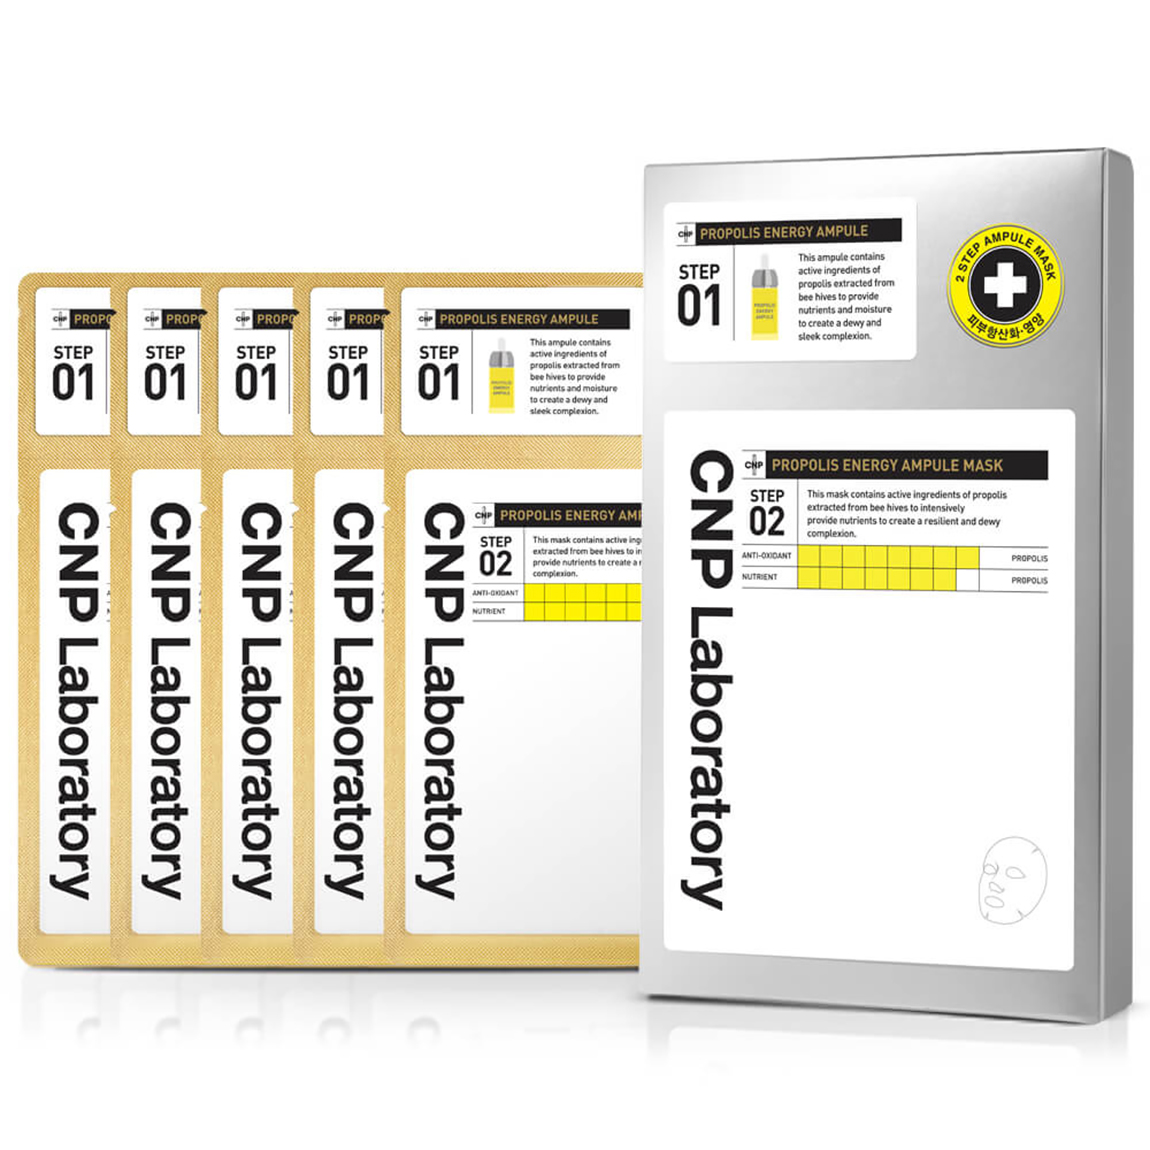 ~CNP Laboratory~蜂膠能量精華面膜盒裝5入~即期良品